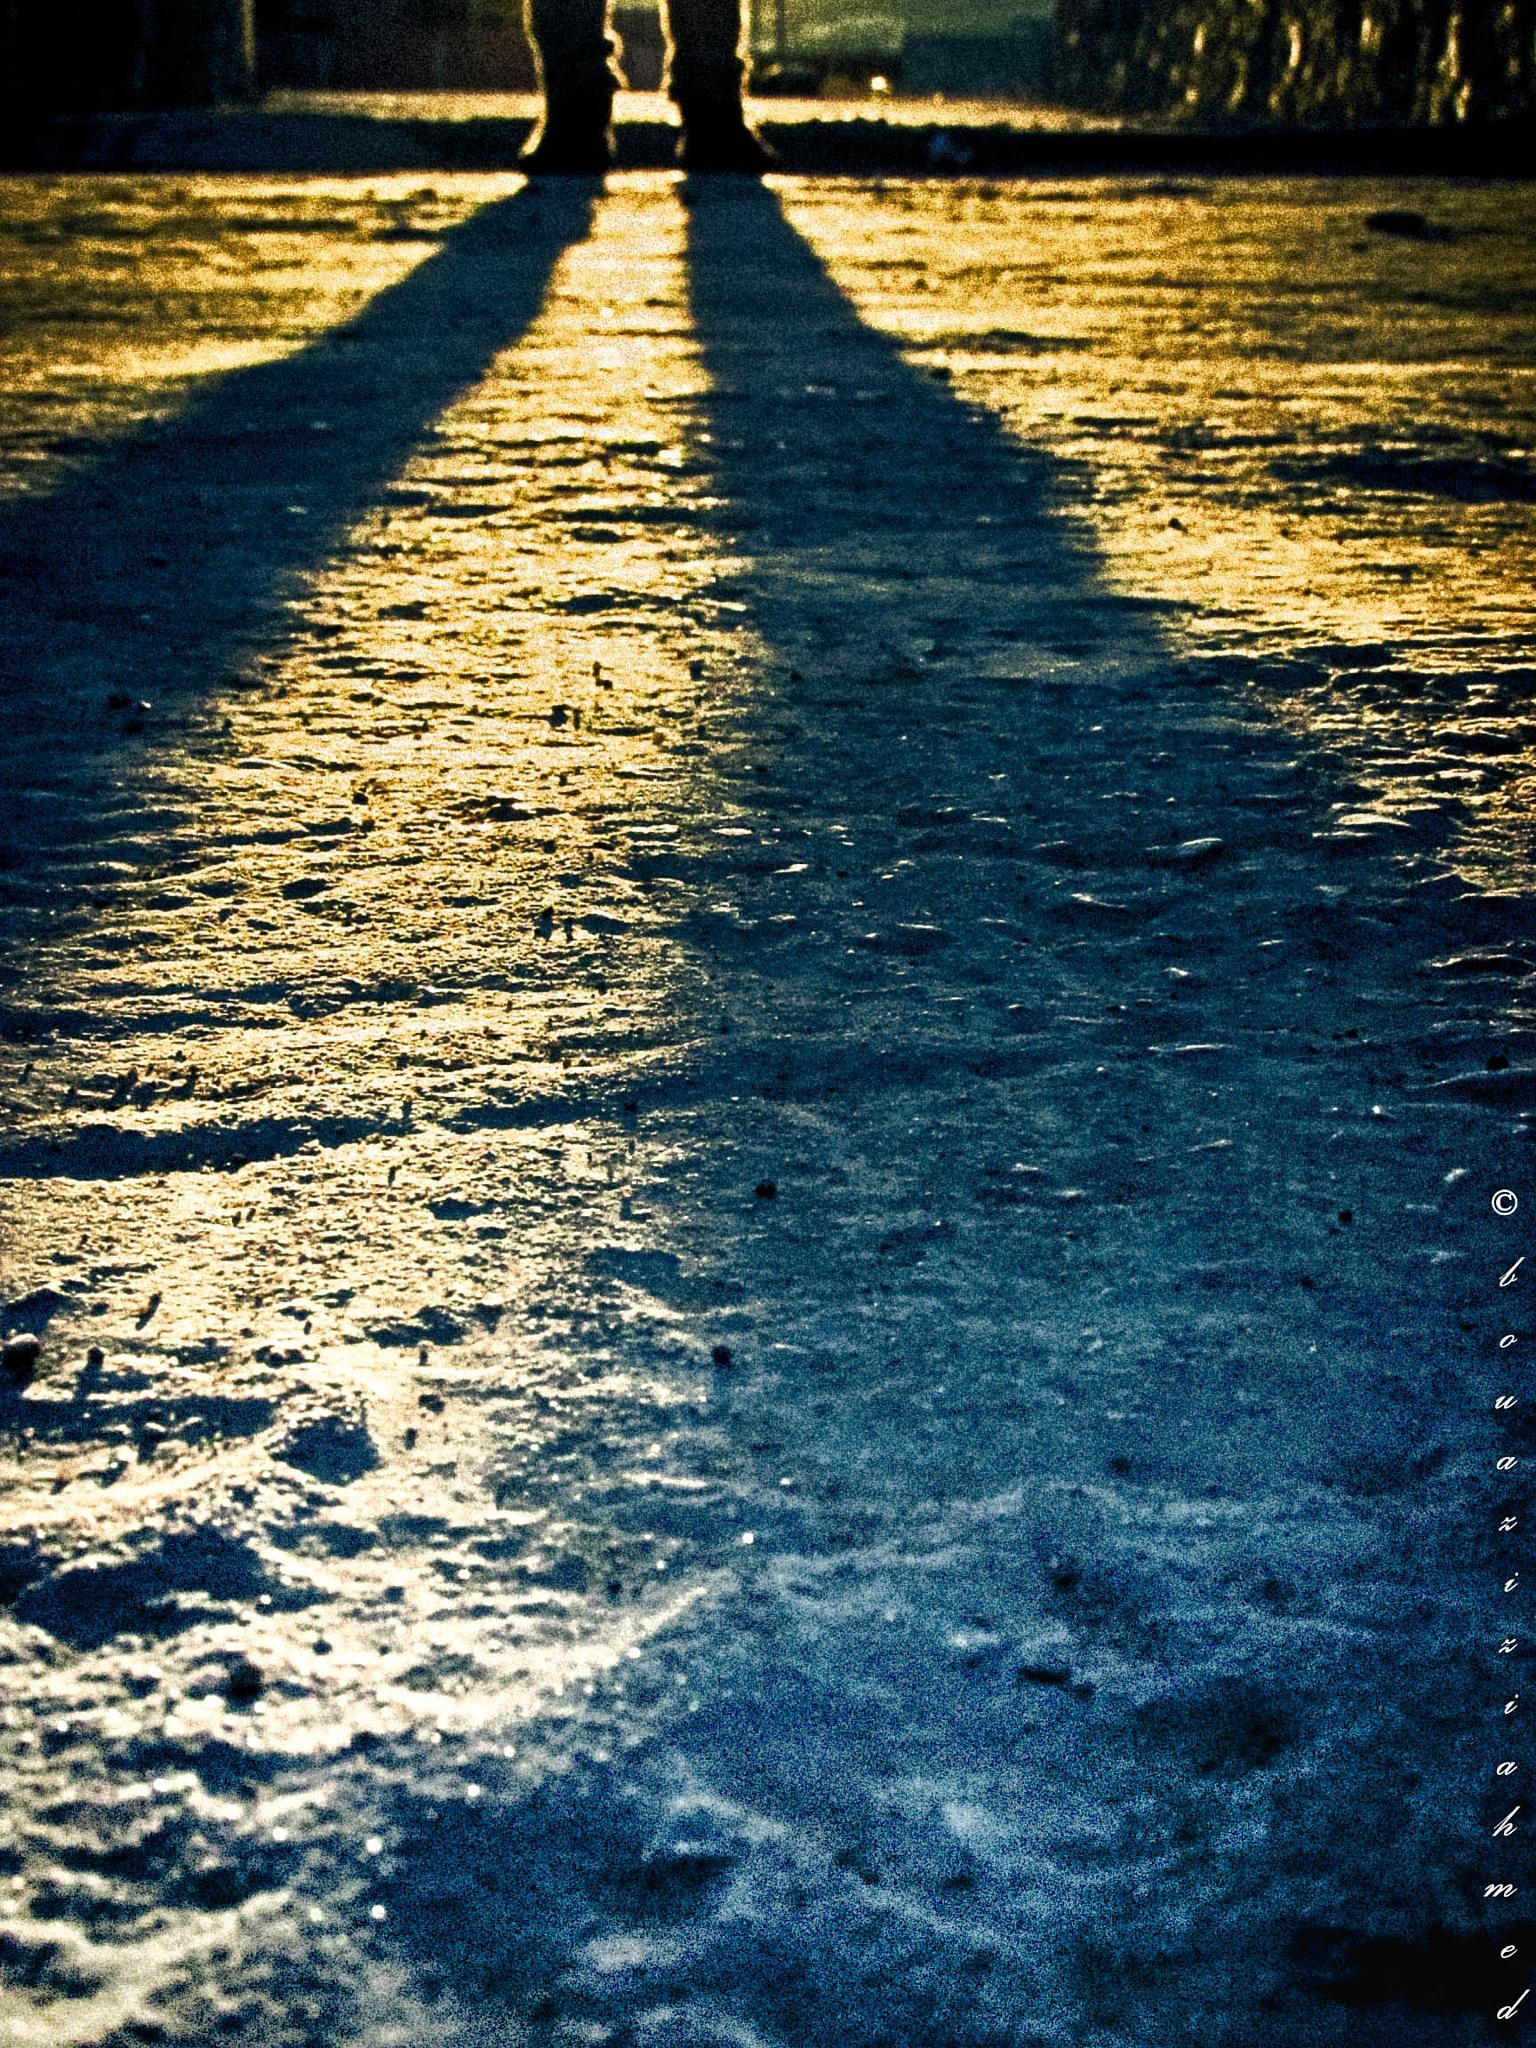 shadow by ahmed bouazizi